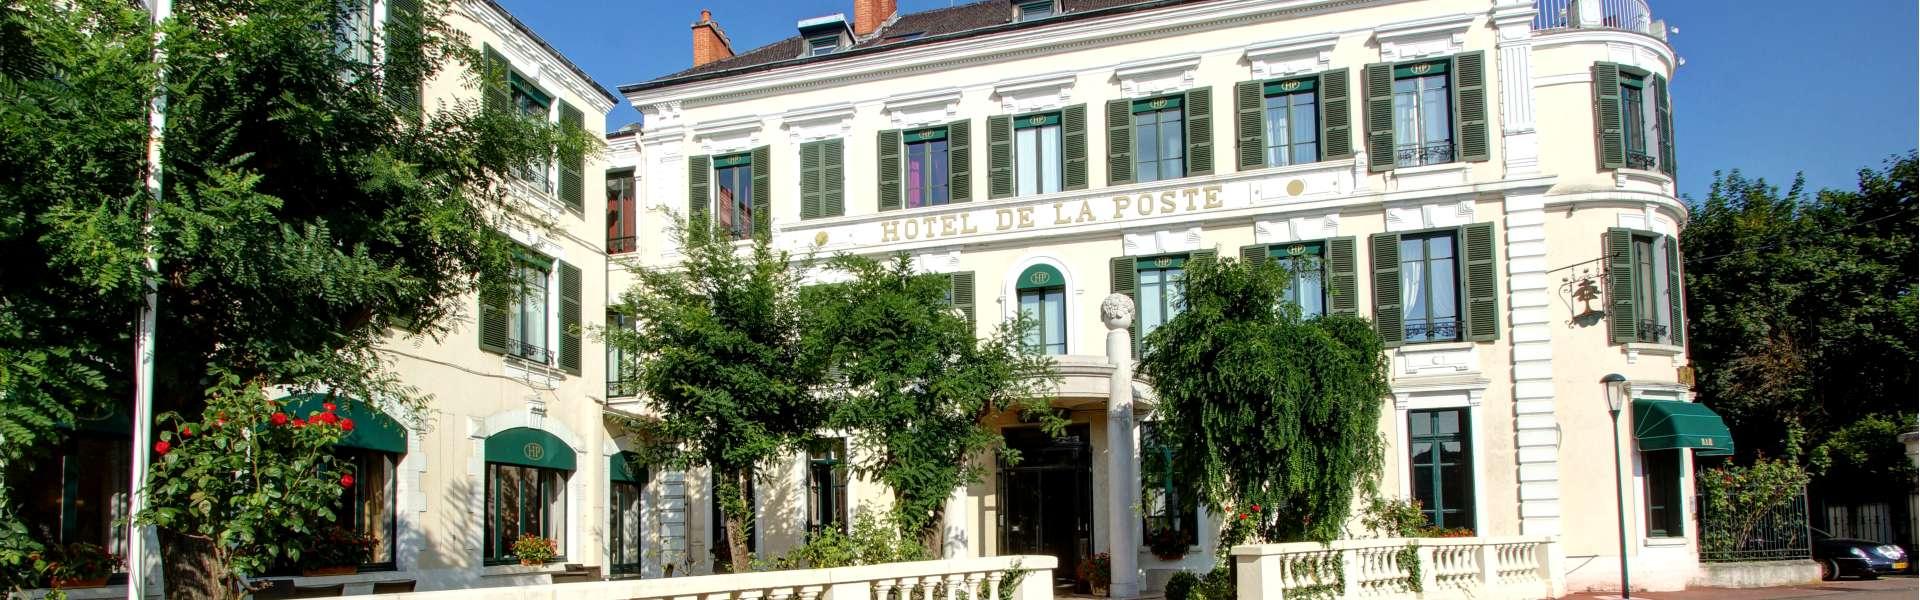 Beaune Hotel La Poste